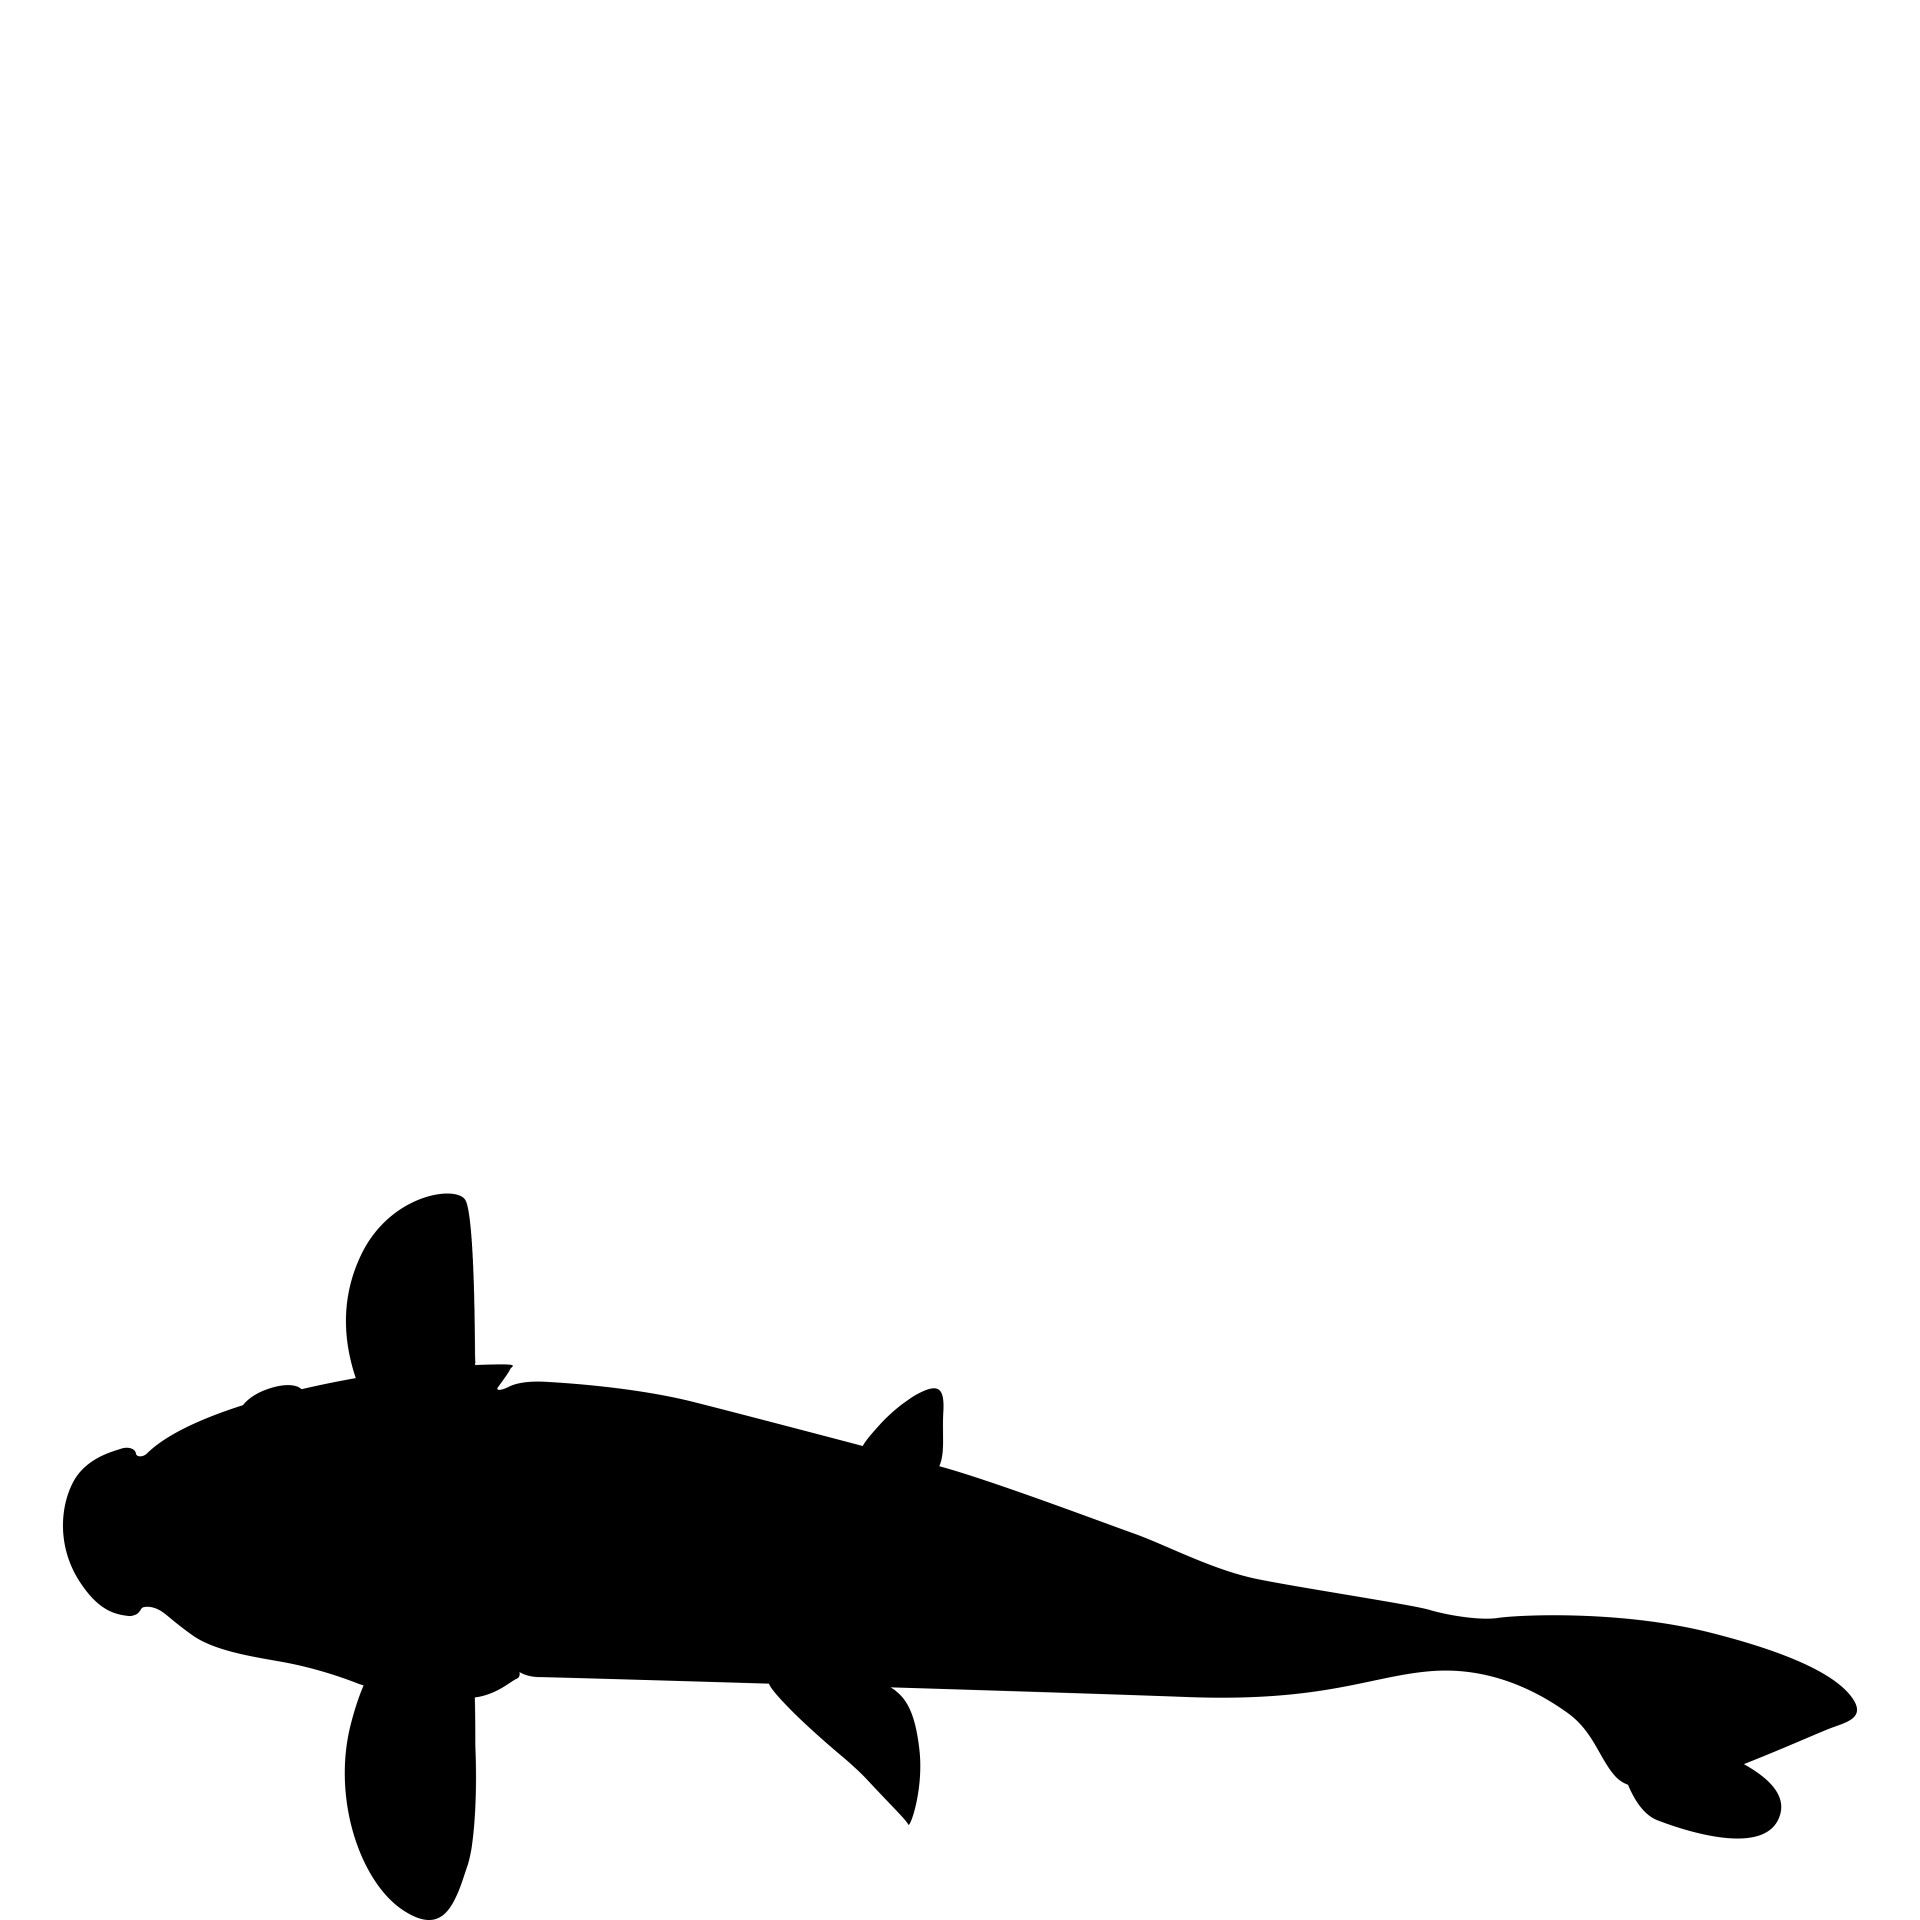 1920x1920 Image Result For Koi Fish Silhouette Koi Fish Fish